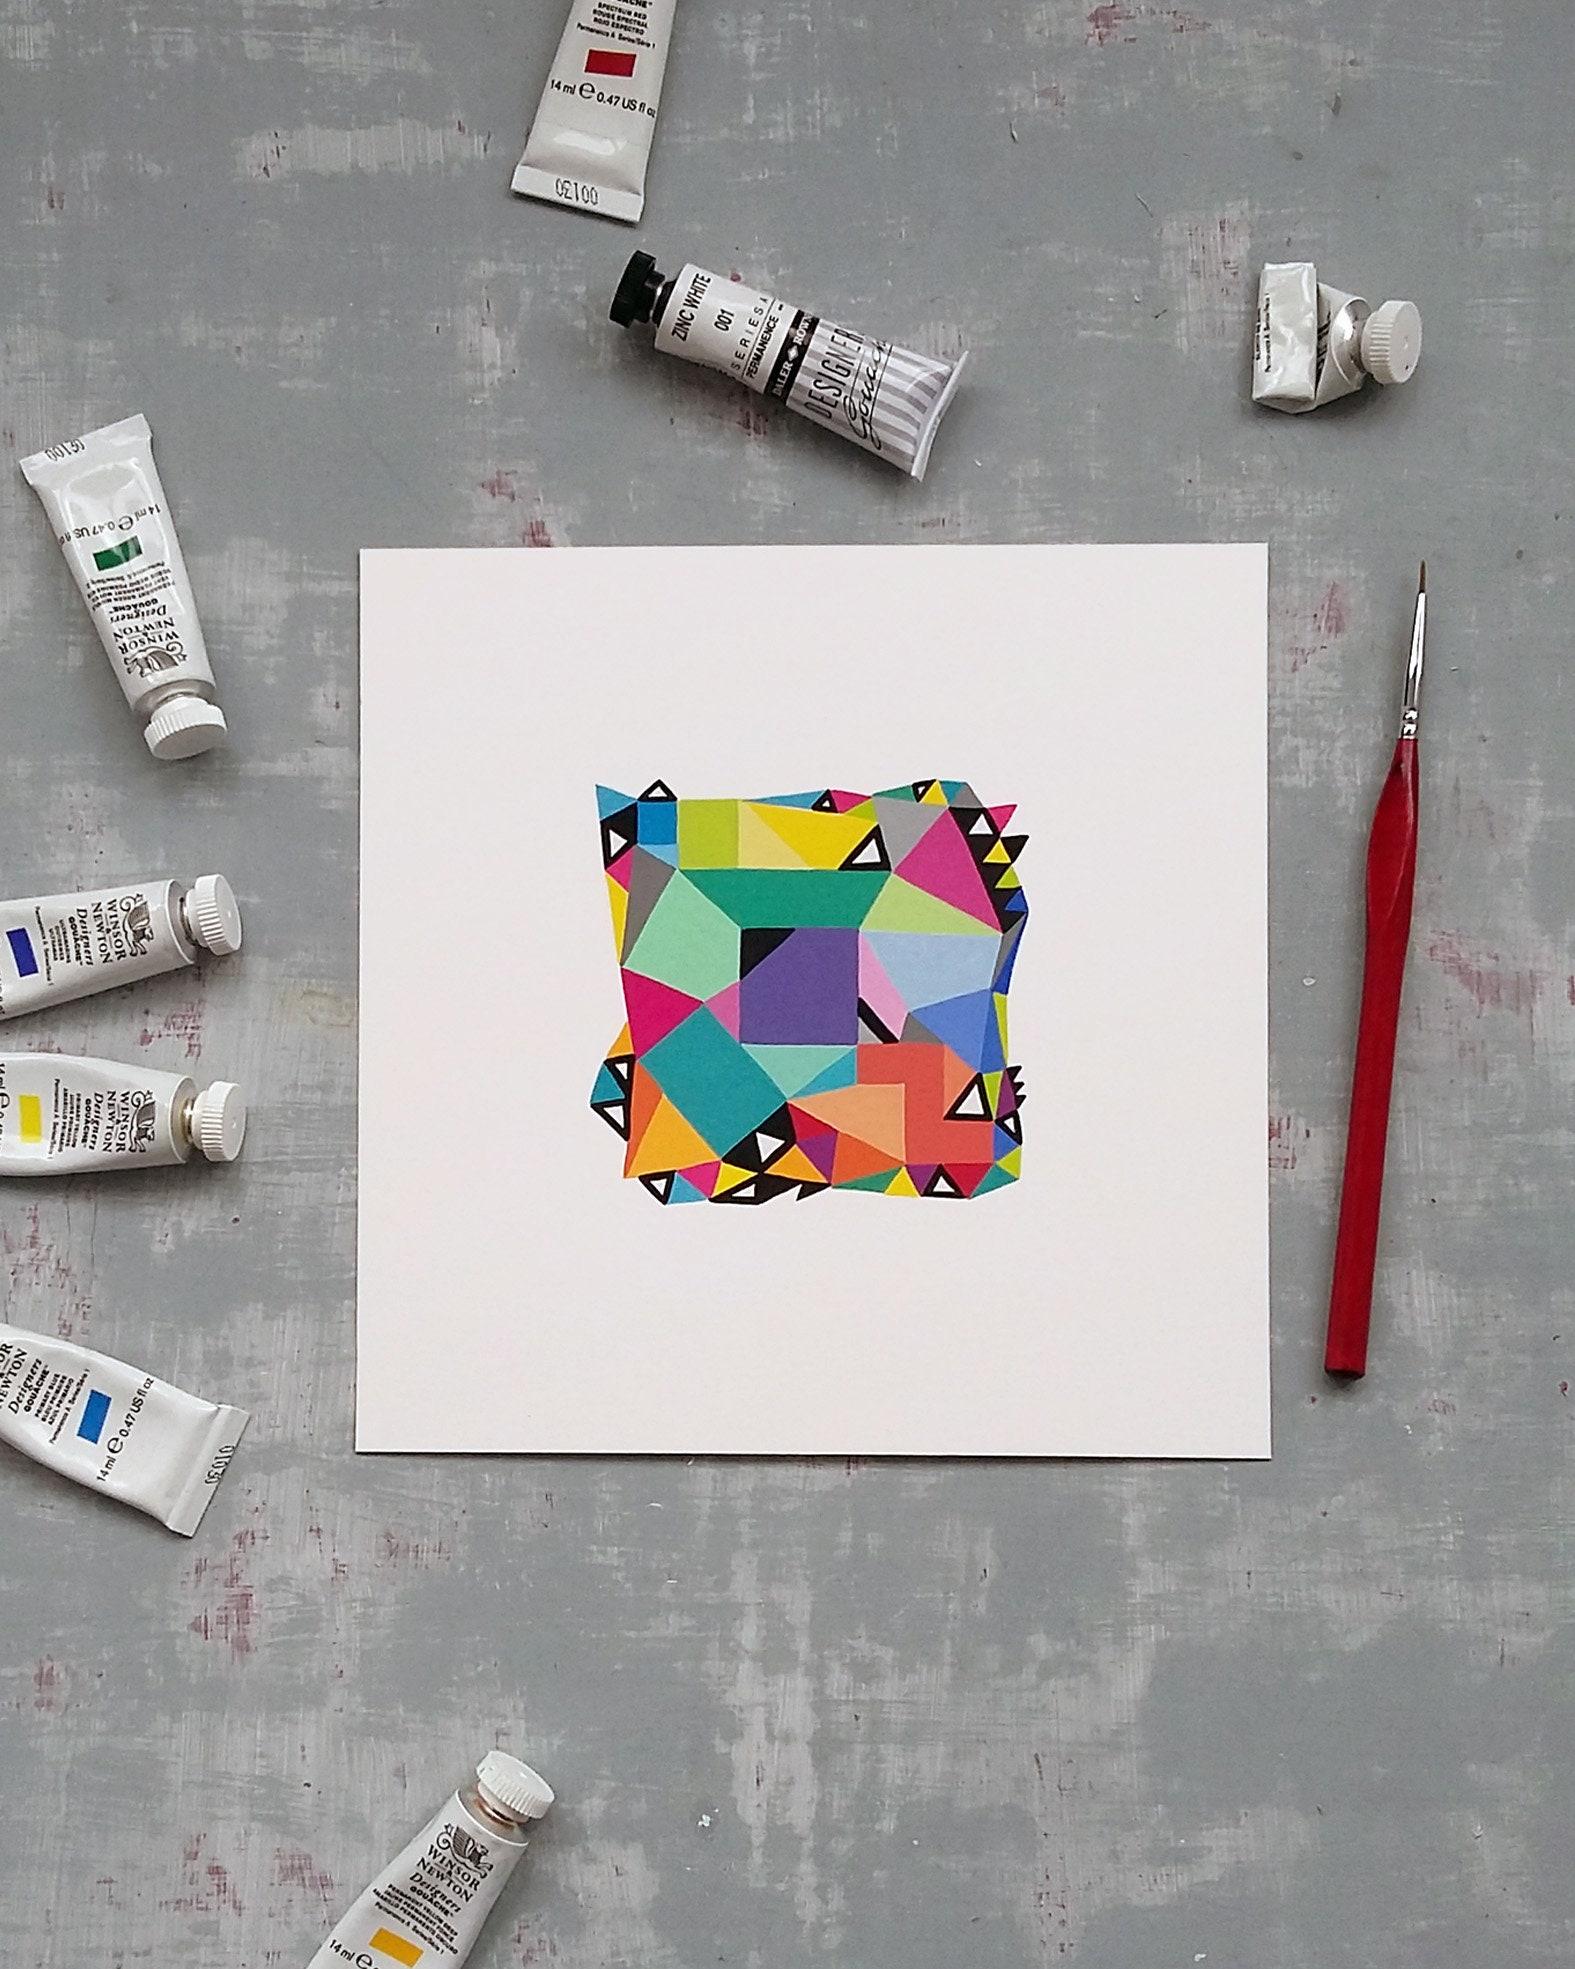 Shape_003, Original geometric art on paper - product image